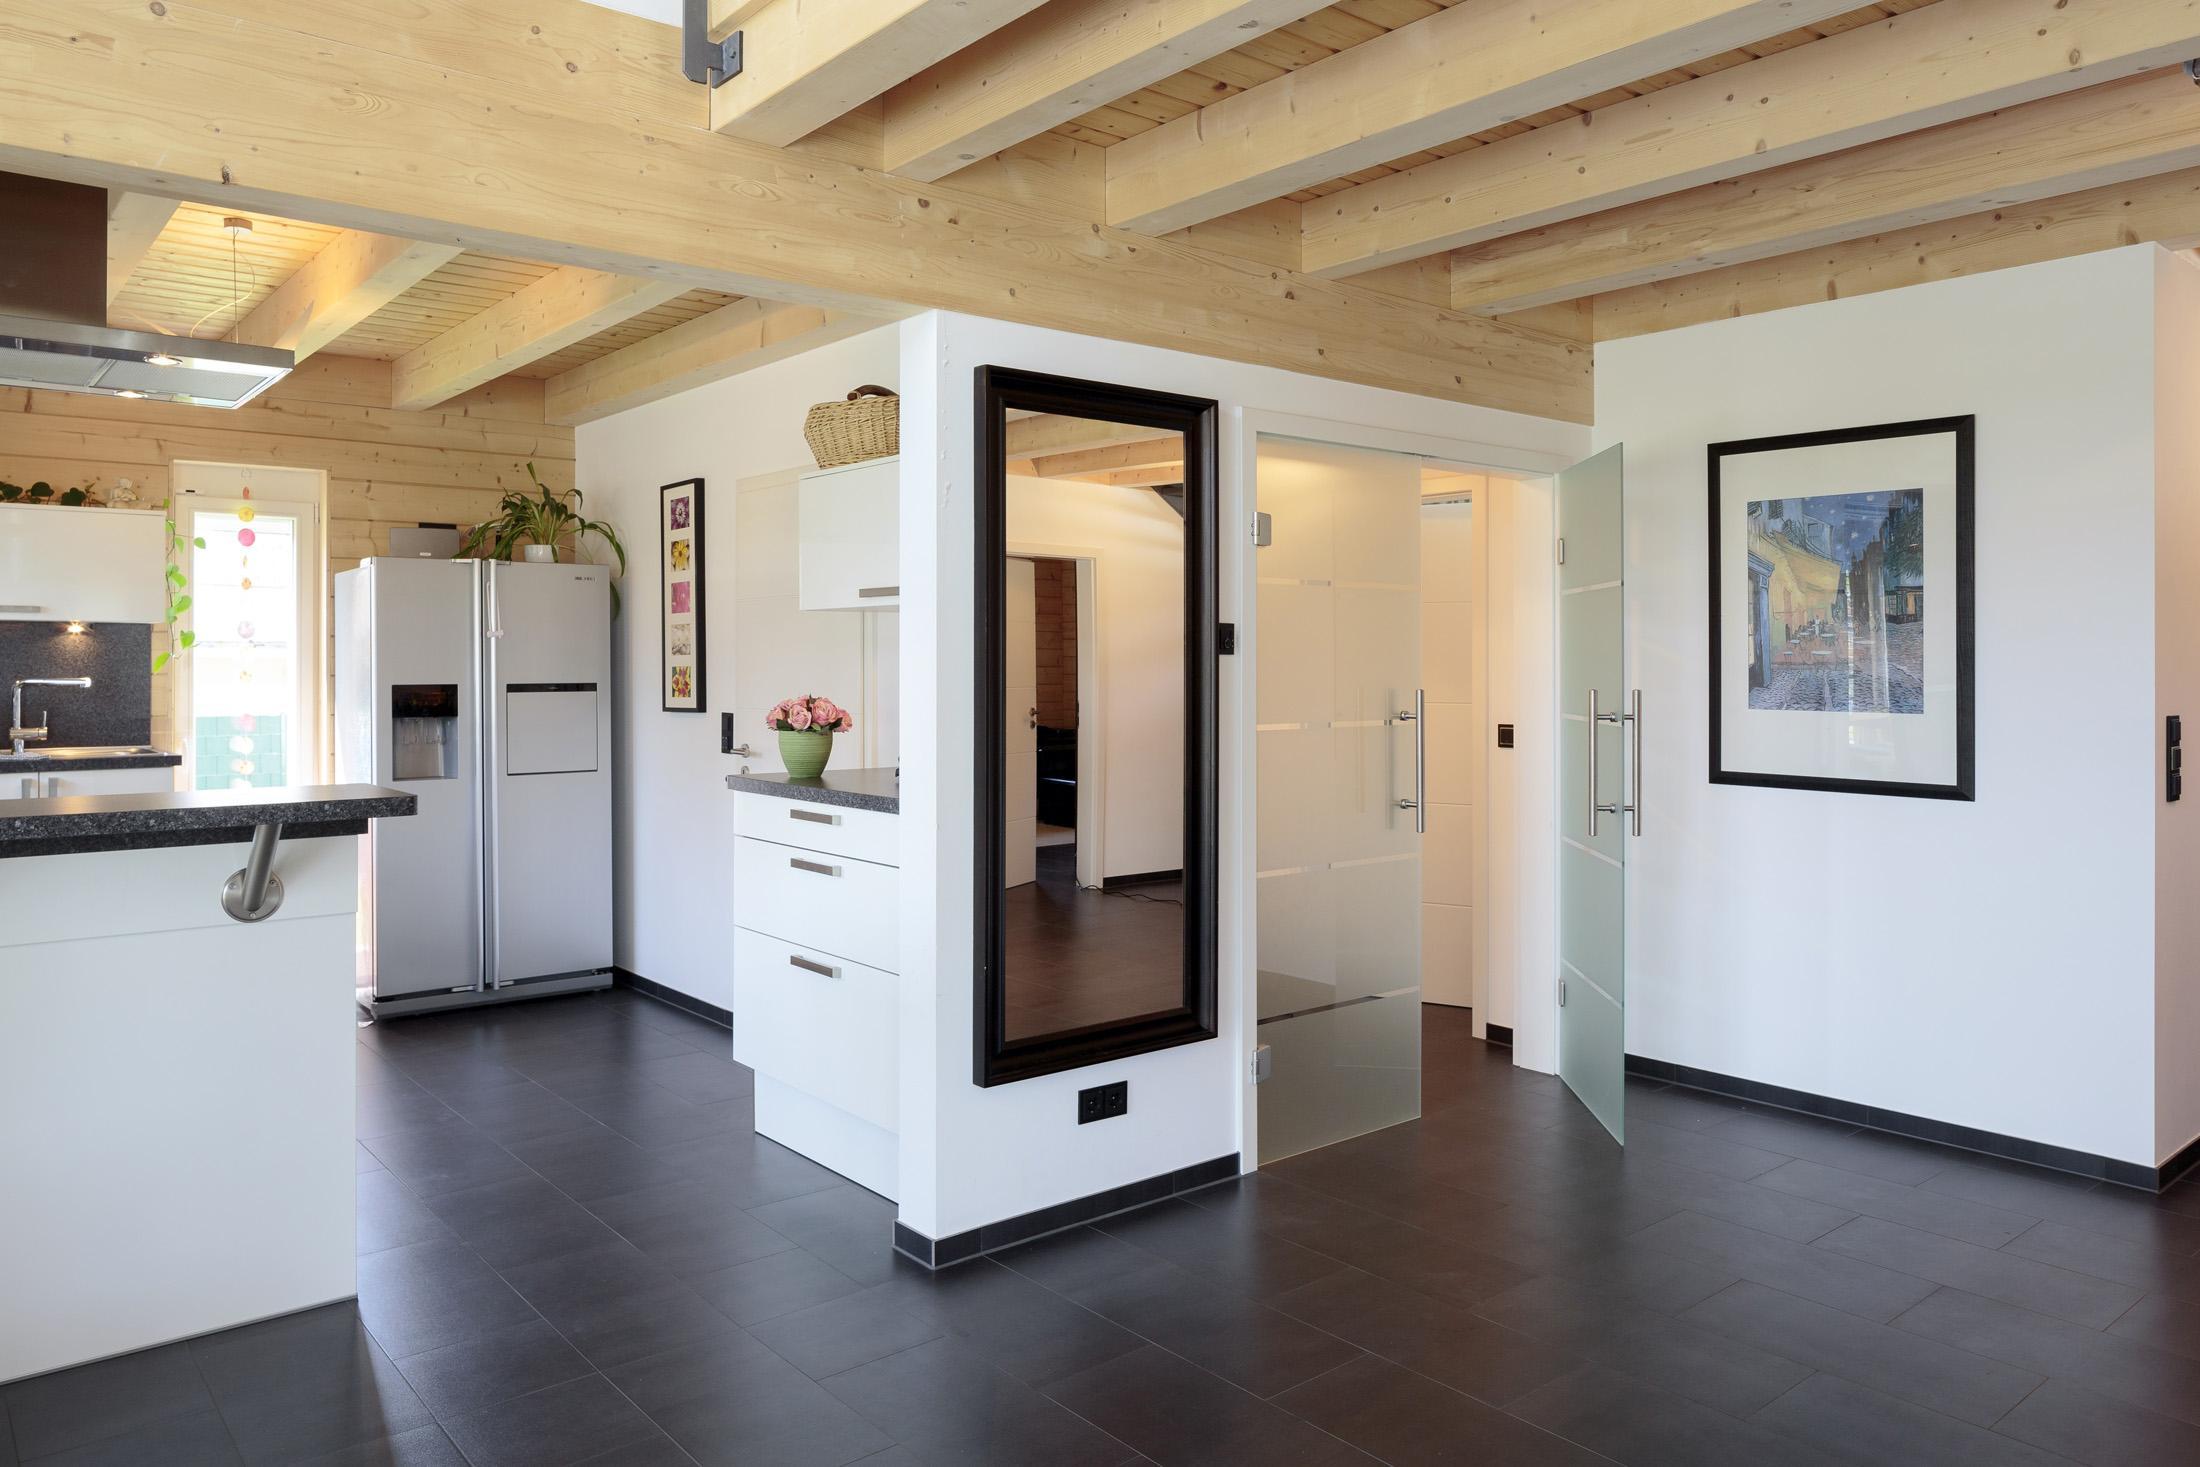 offene k che fliesen spiegel holzdecke holzbalke. Black Bedroom Furniture Sets. Home Design Ideas